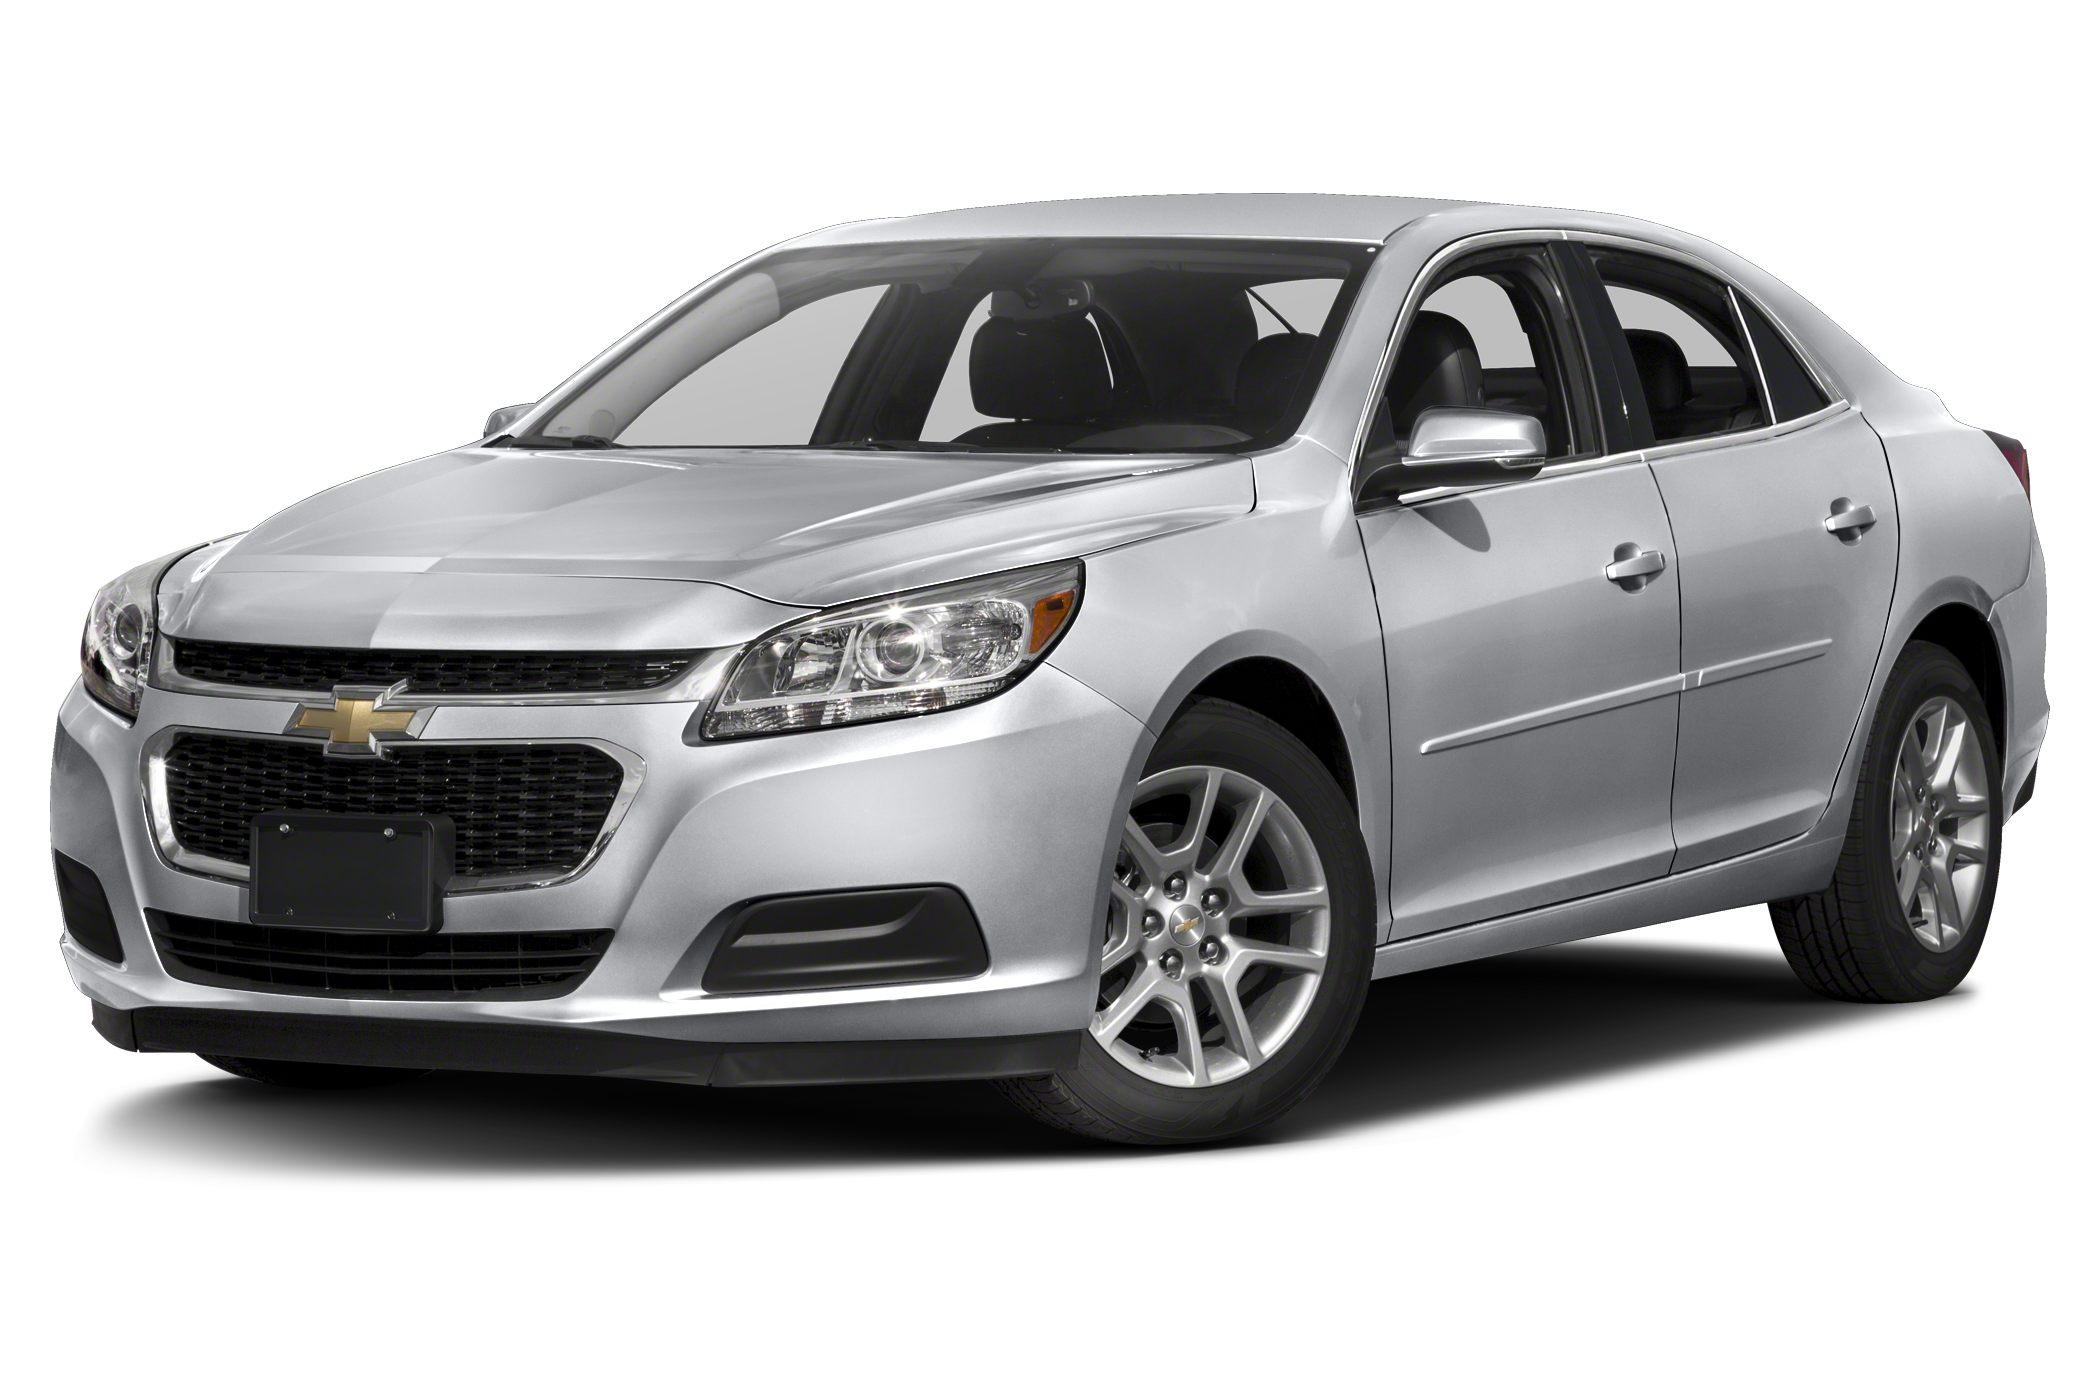 2016 Chevrolet Malibu Limited LT 4dr Sedan Equipment